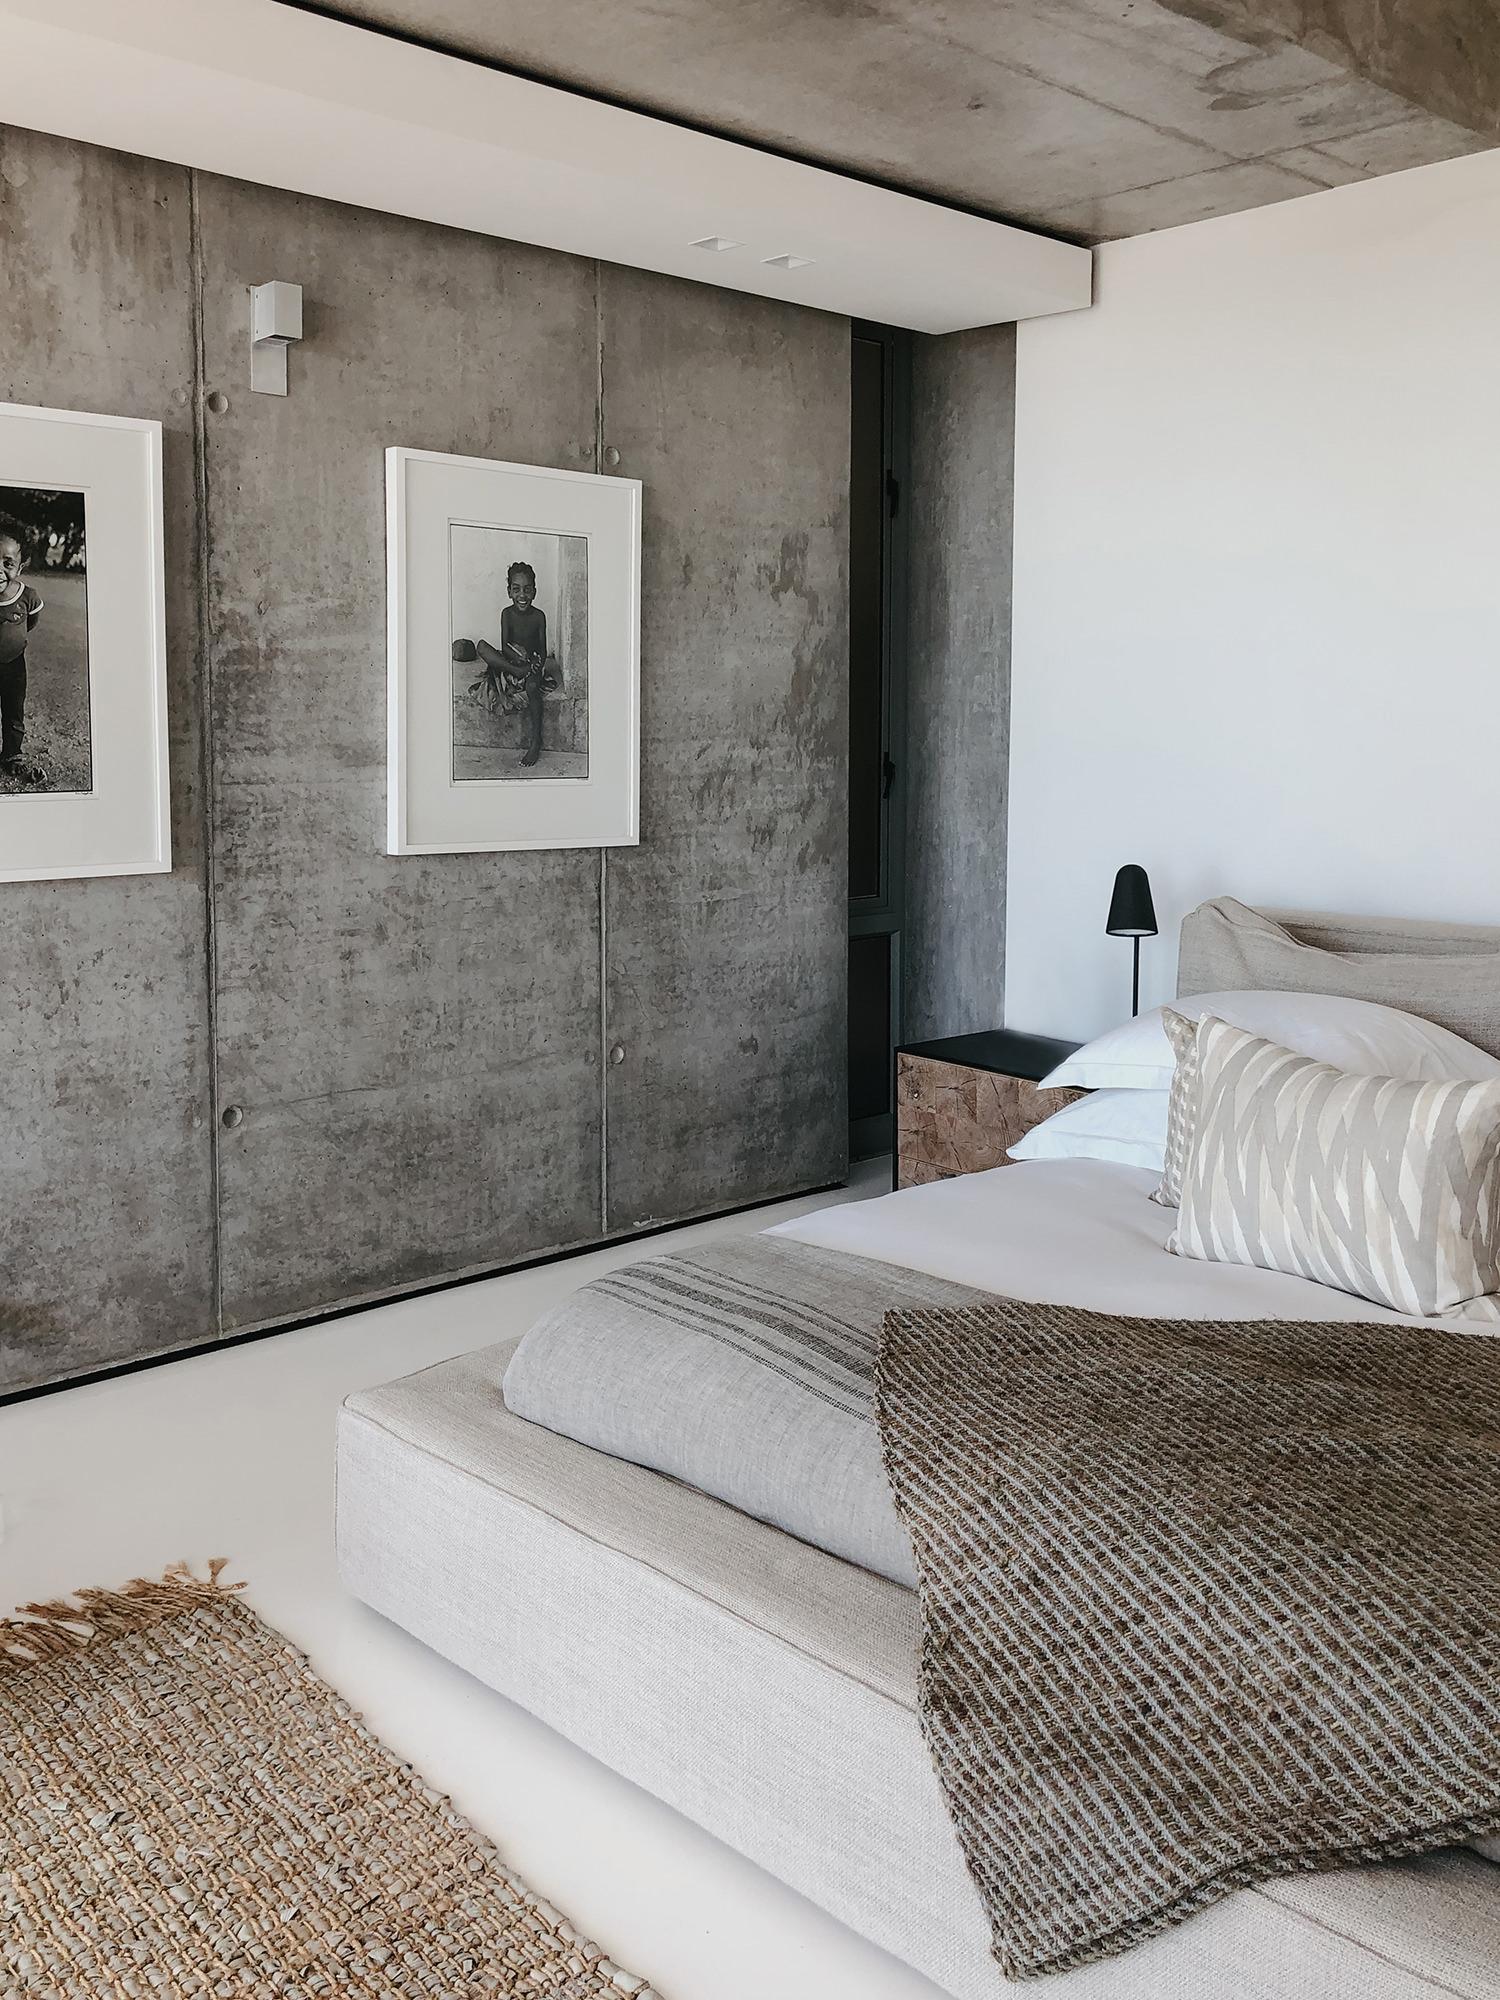 Interior-Fotograf-Hamburg-Anna-Fichtner-Interiorfotografie-Fotoshooting-Kapstadt-i9